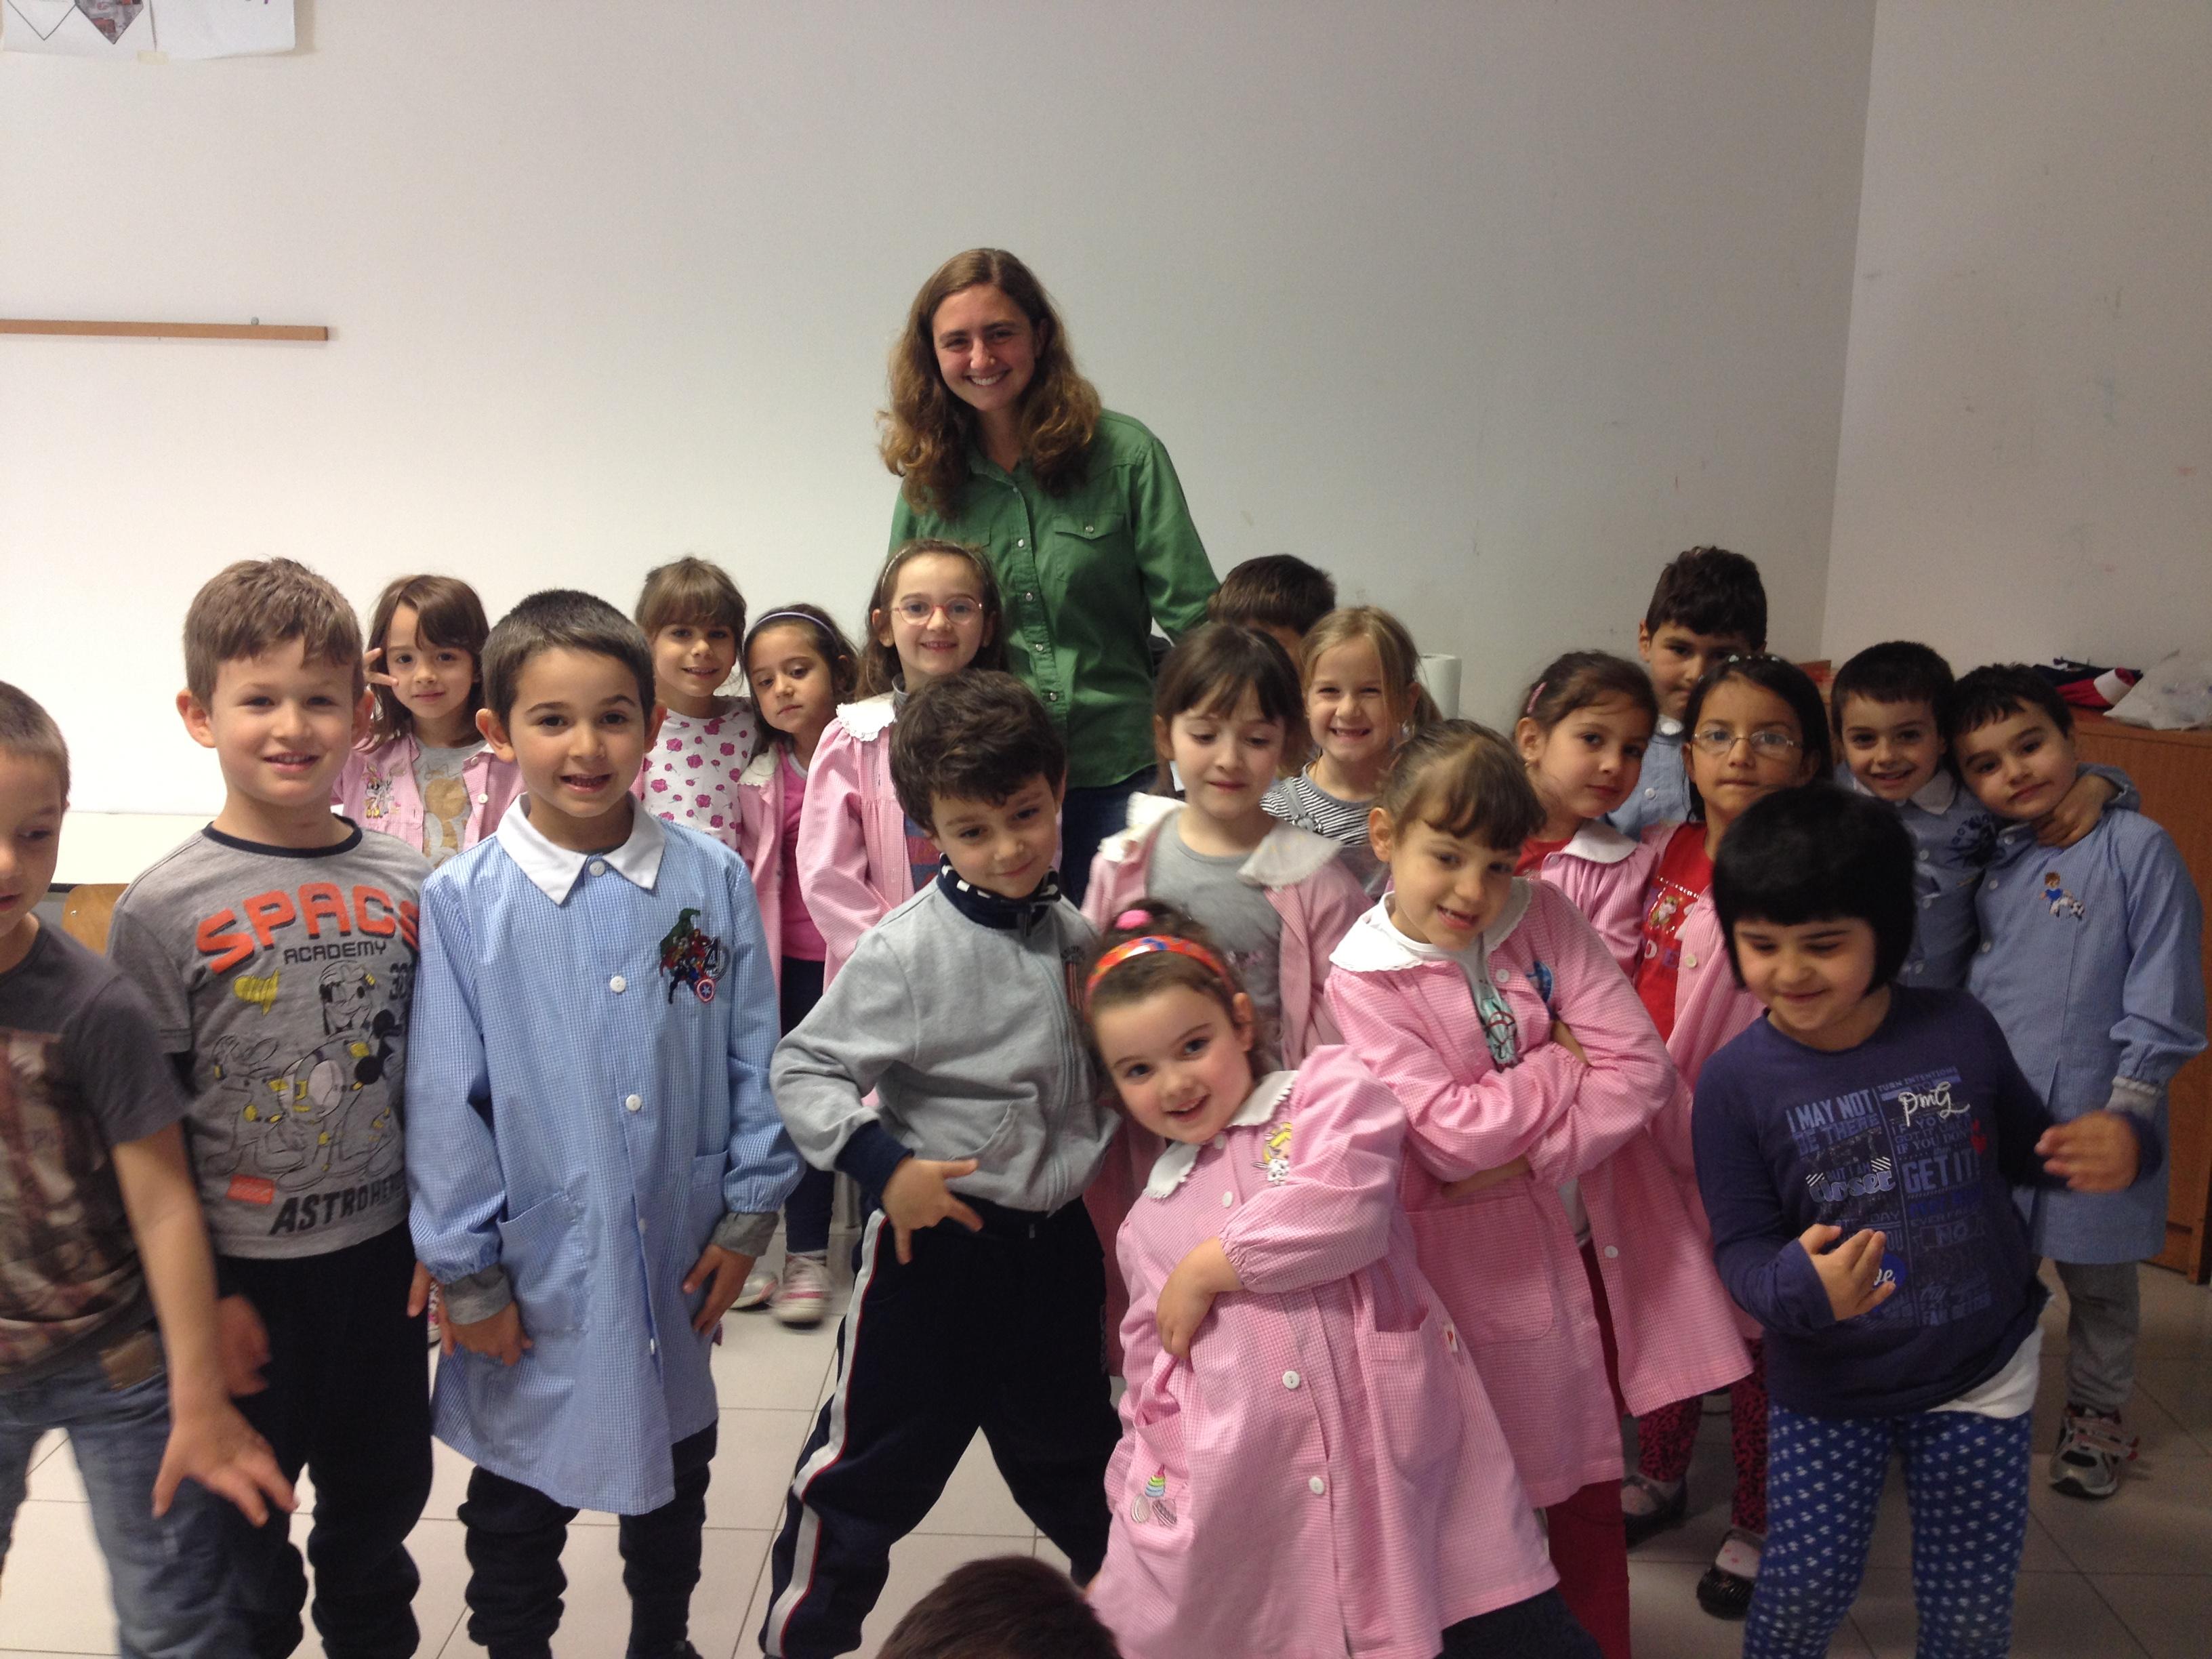 Italy Tuscania- Megan Matheney volunteered at an Italian preschool teaching English